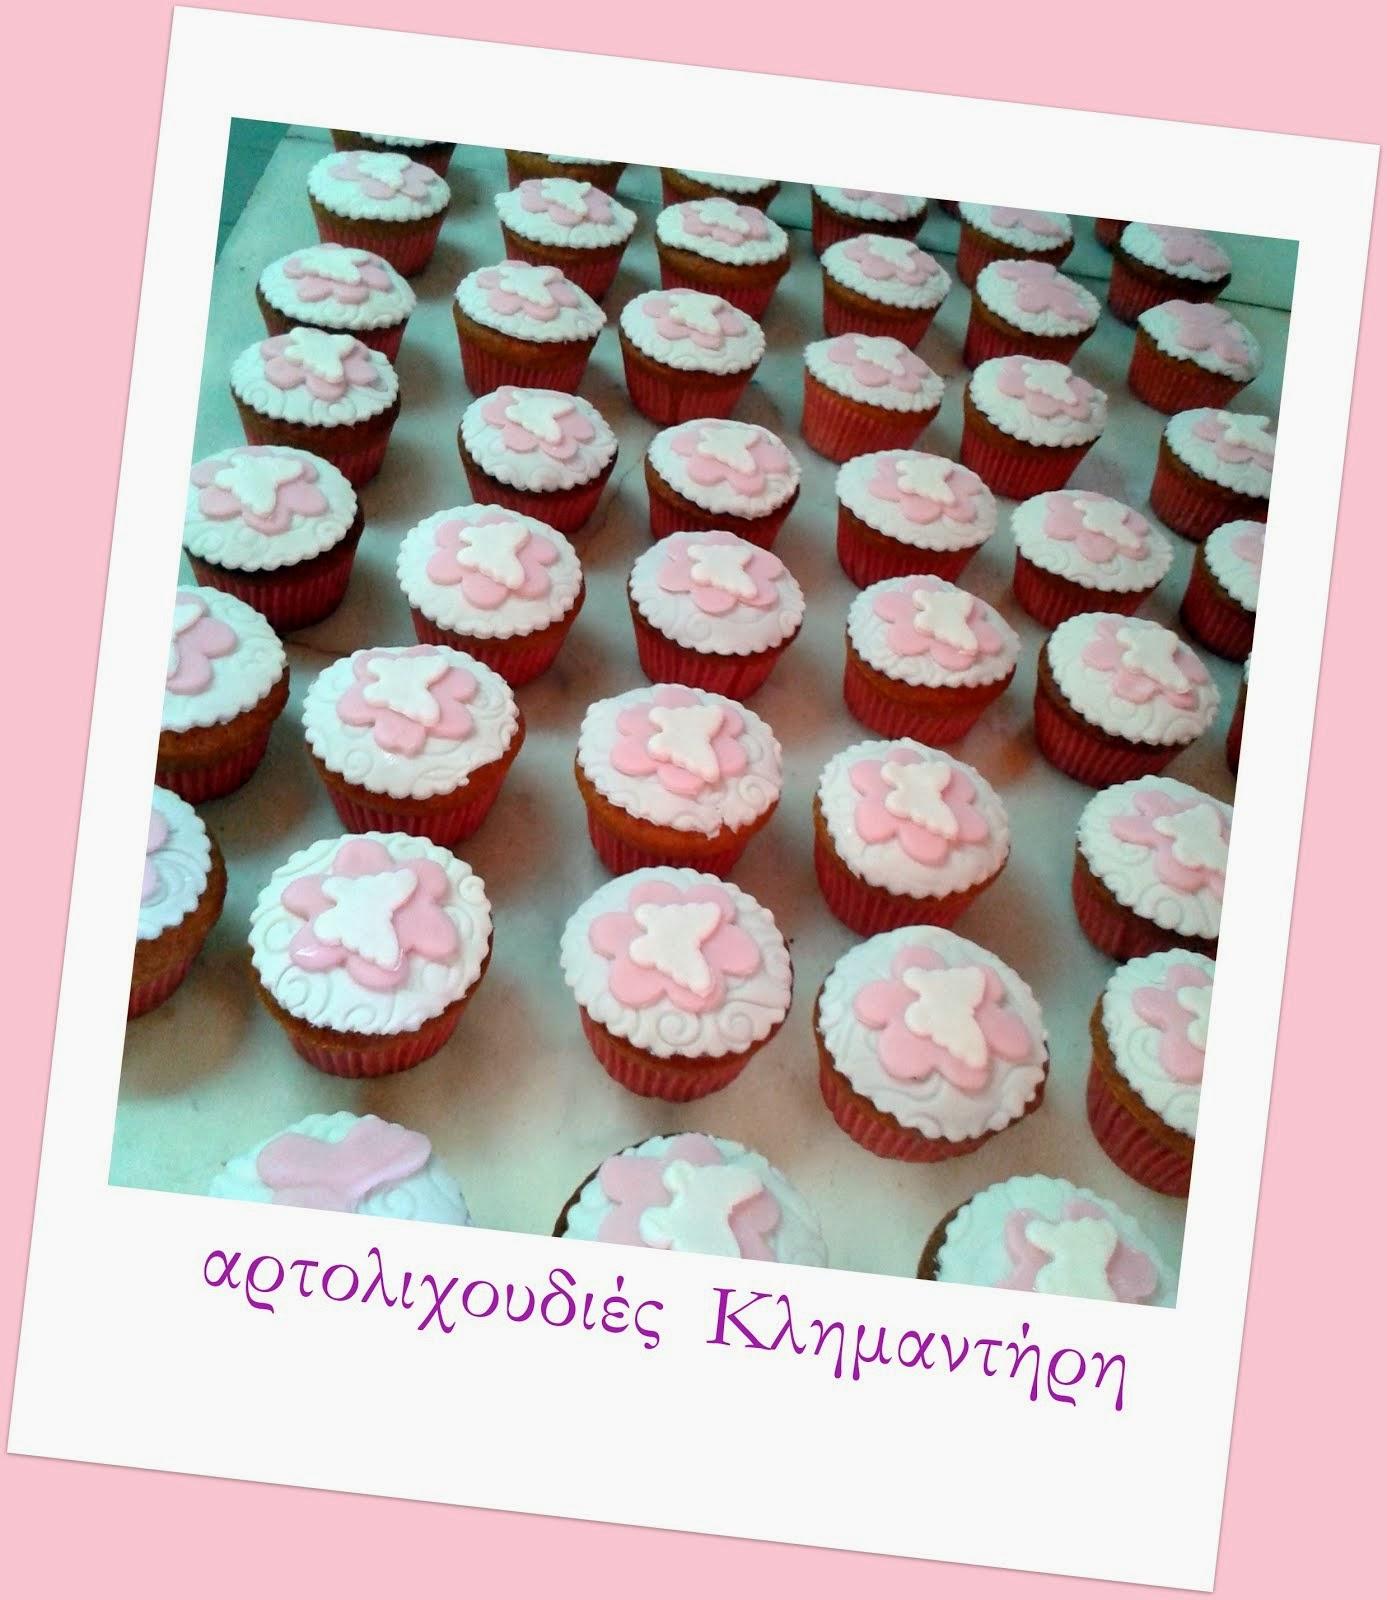 Cupcakes ...ολοκληρωμενες προτασεις για την βαπτιση , το παιδικο παρτυ , τα γενεθλια σας!